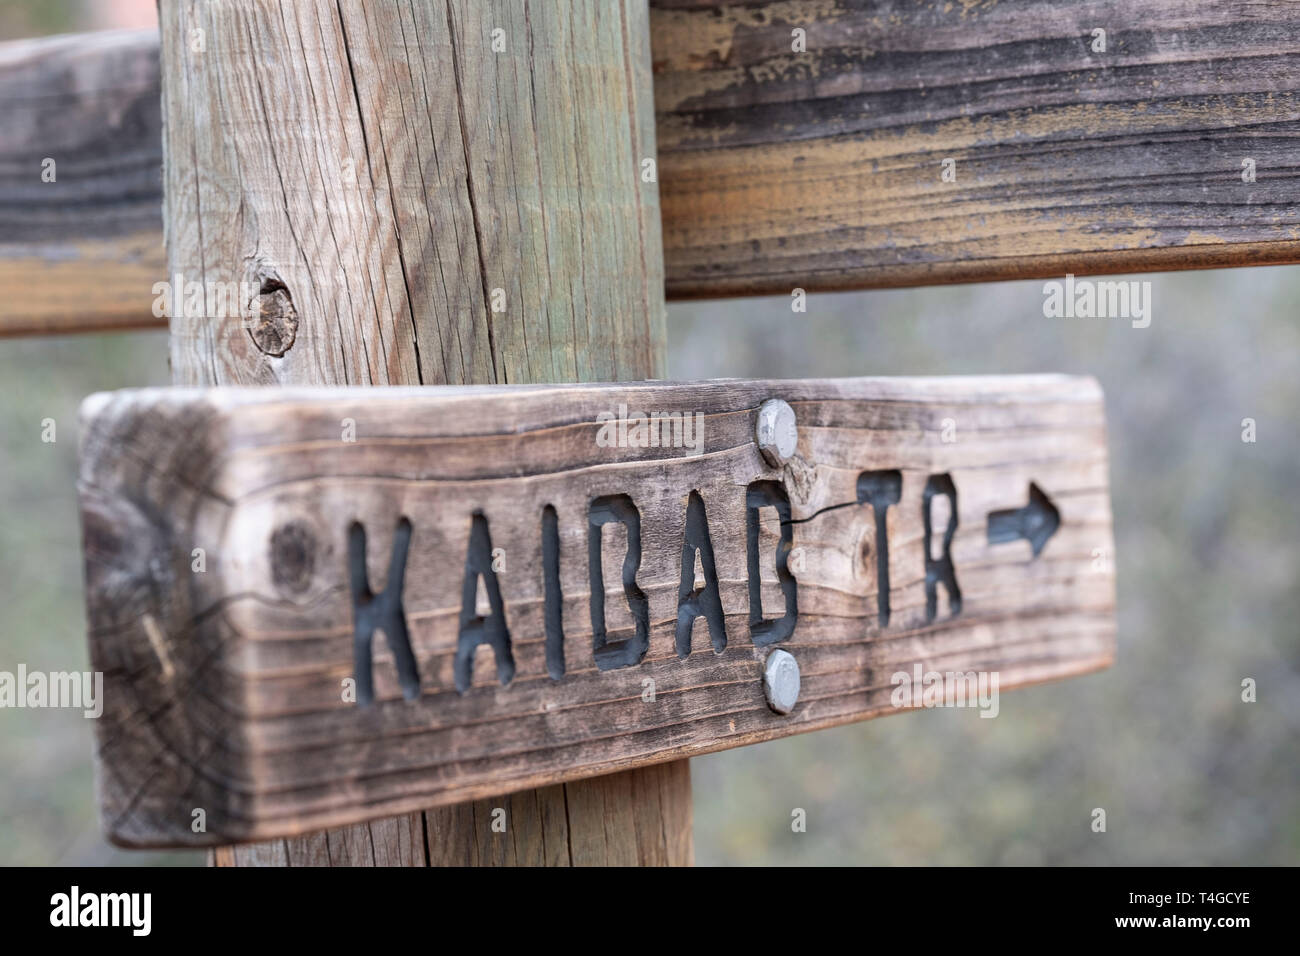 Trail sign, Sedona Arizona, USA - Stock Image